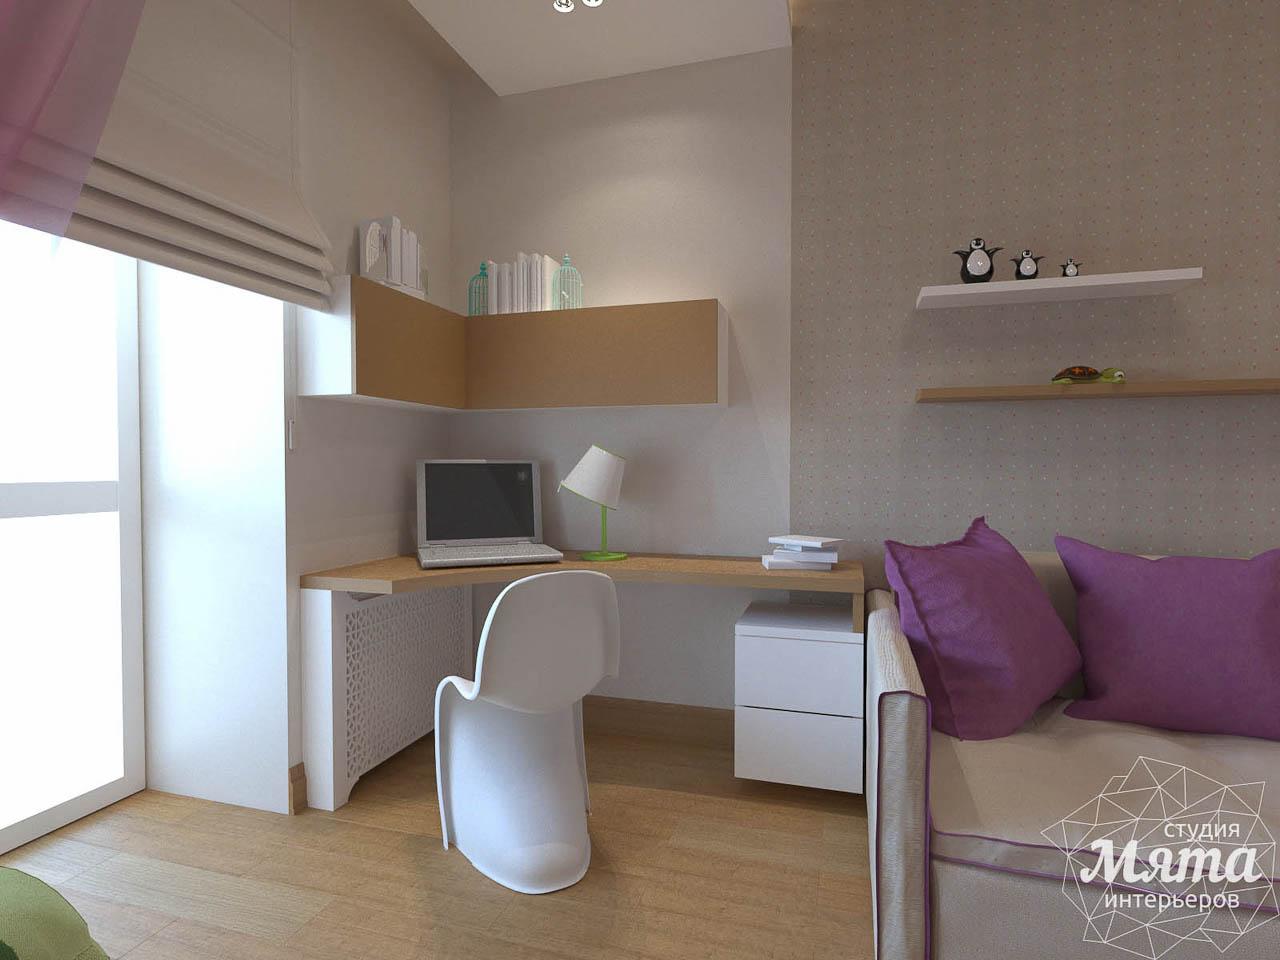 Дизайн интерьера трехкомнатной квартиры по ул. Мельникова 27 img1661408422